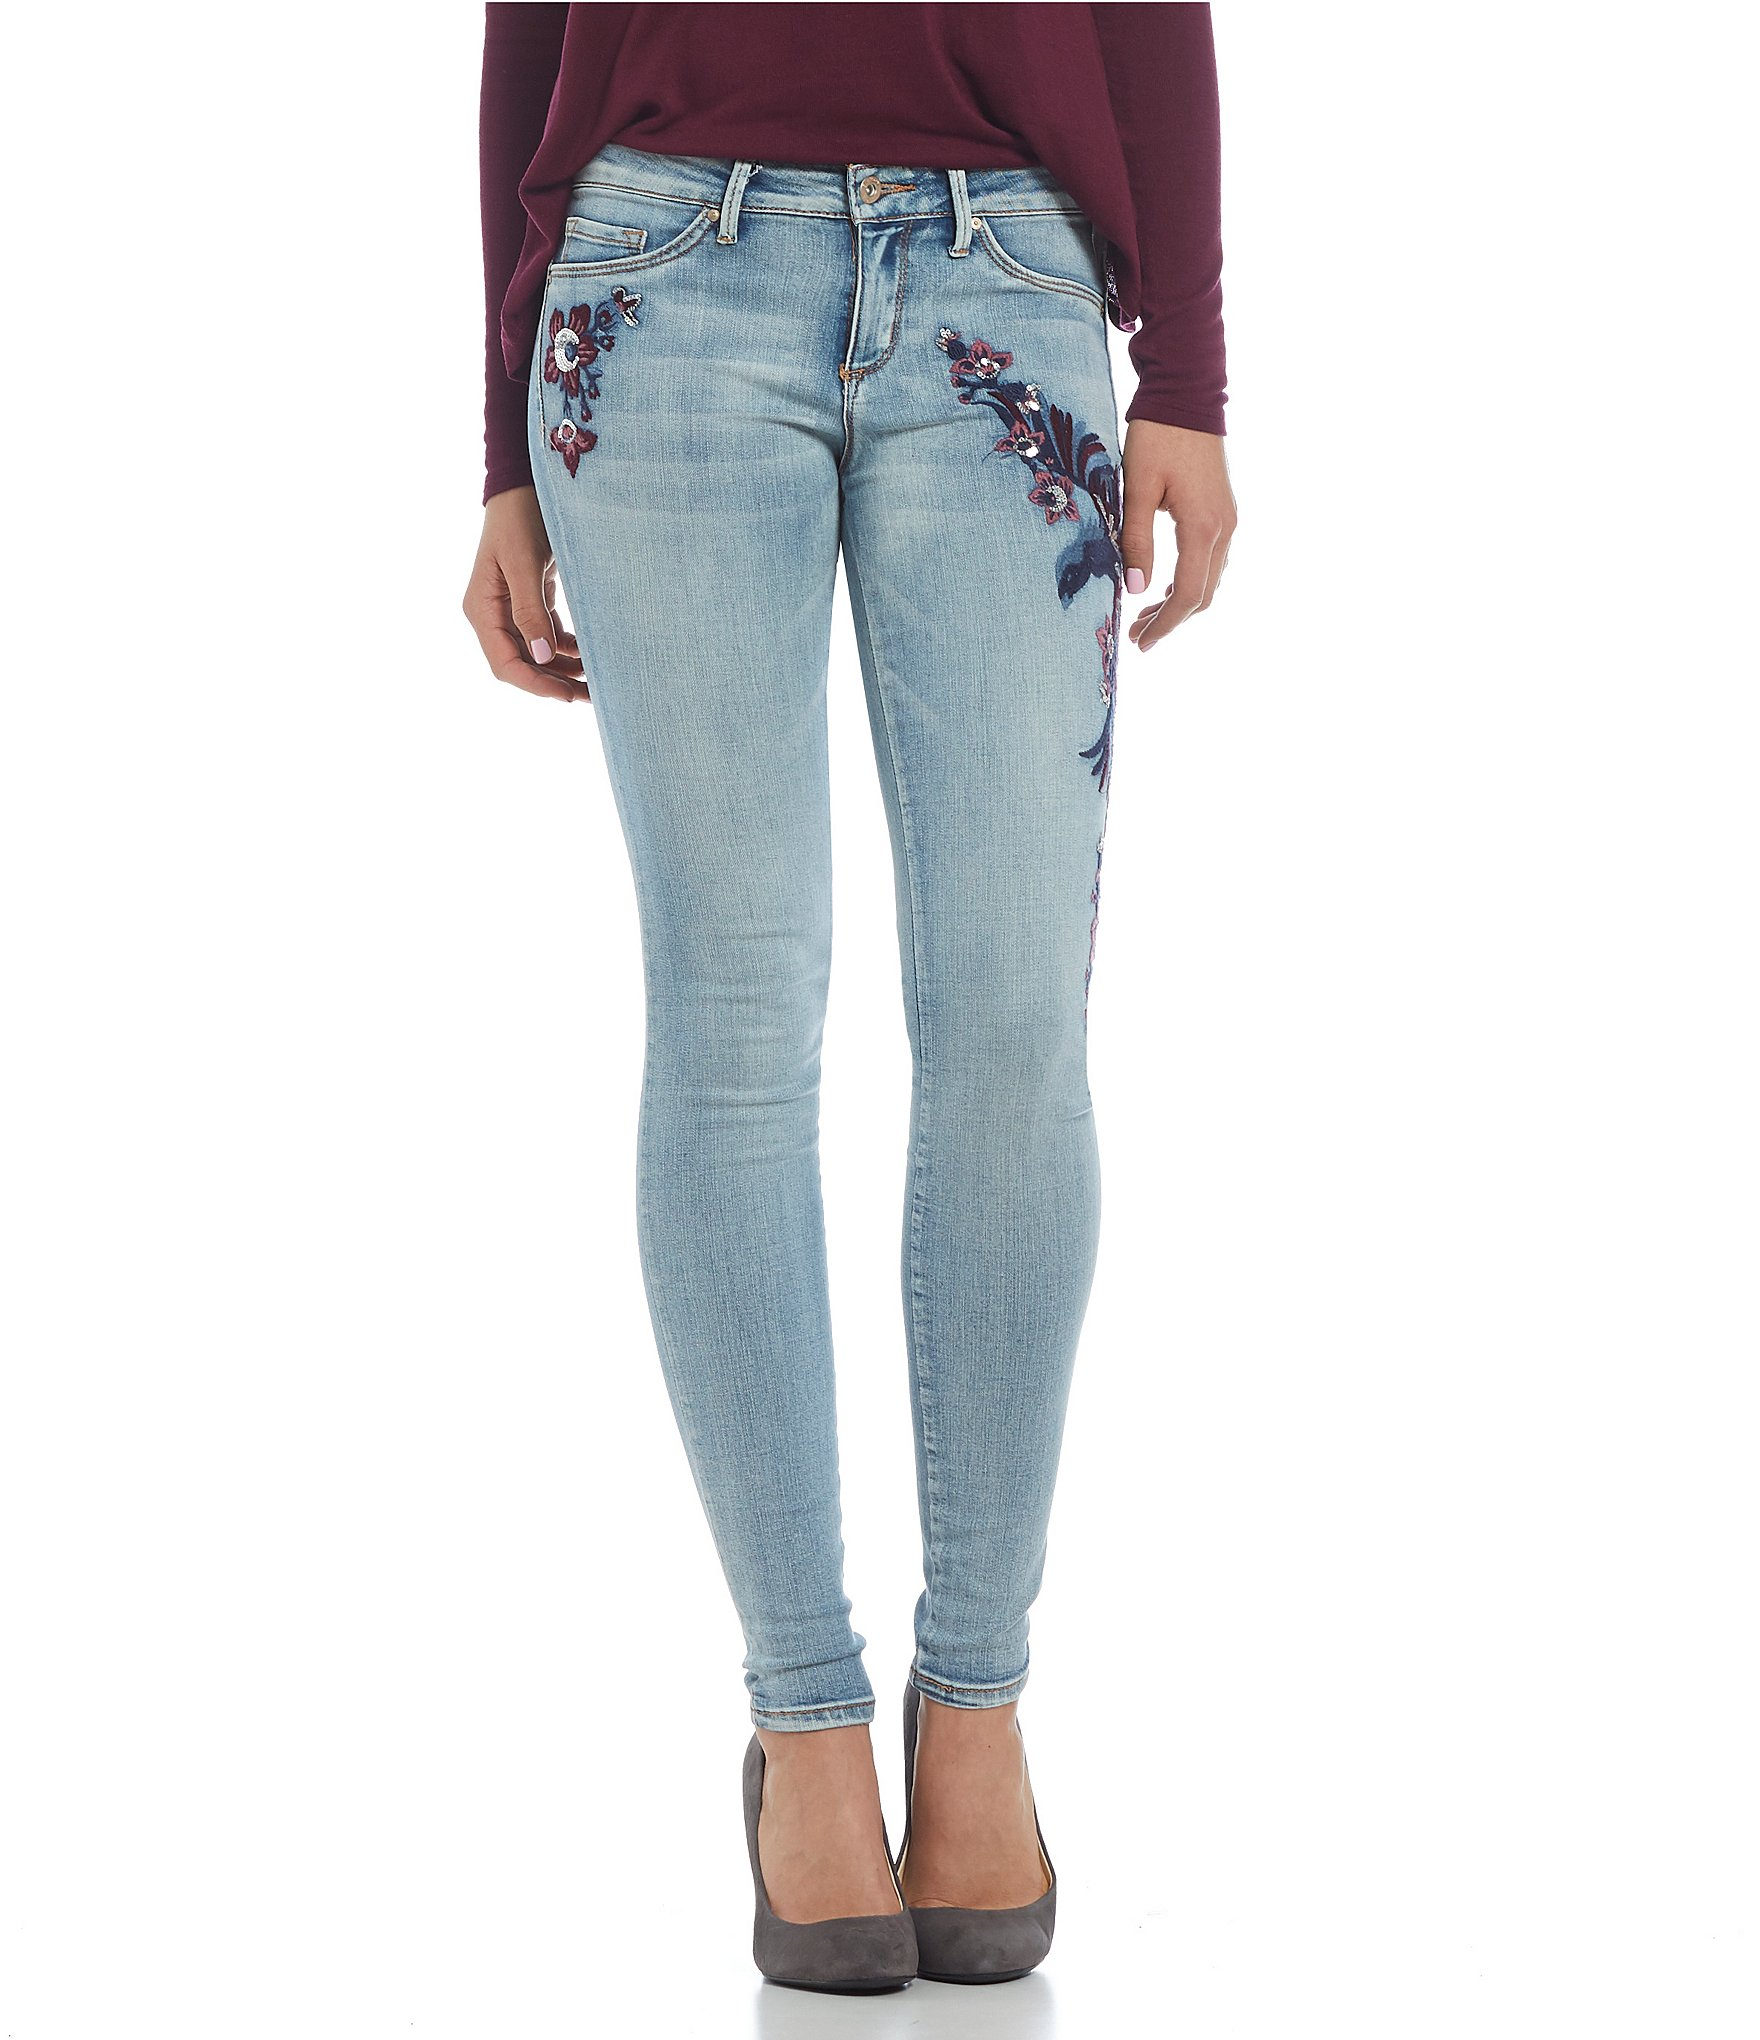 DENIM - Denim trousers JS EXTE Discount Collections I9cH55